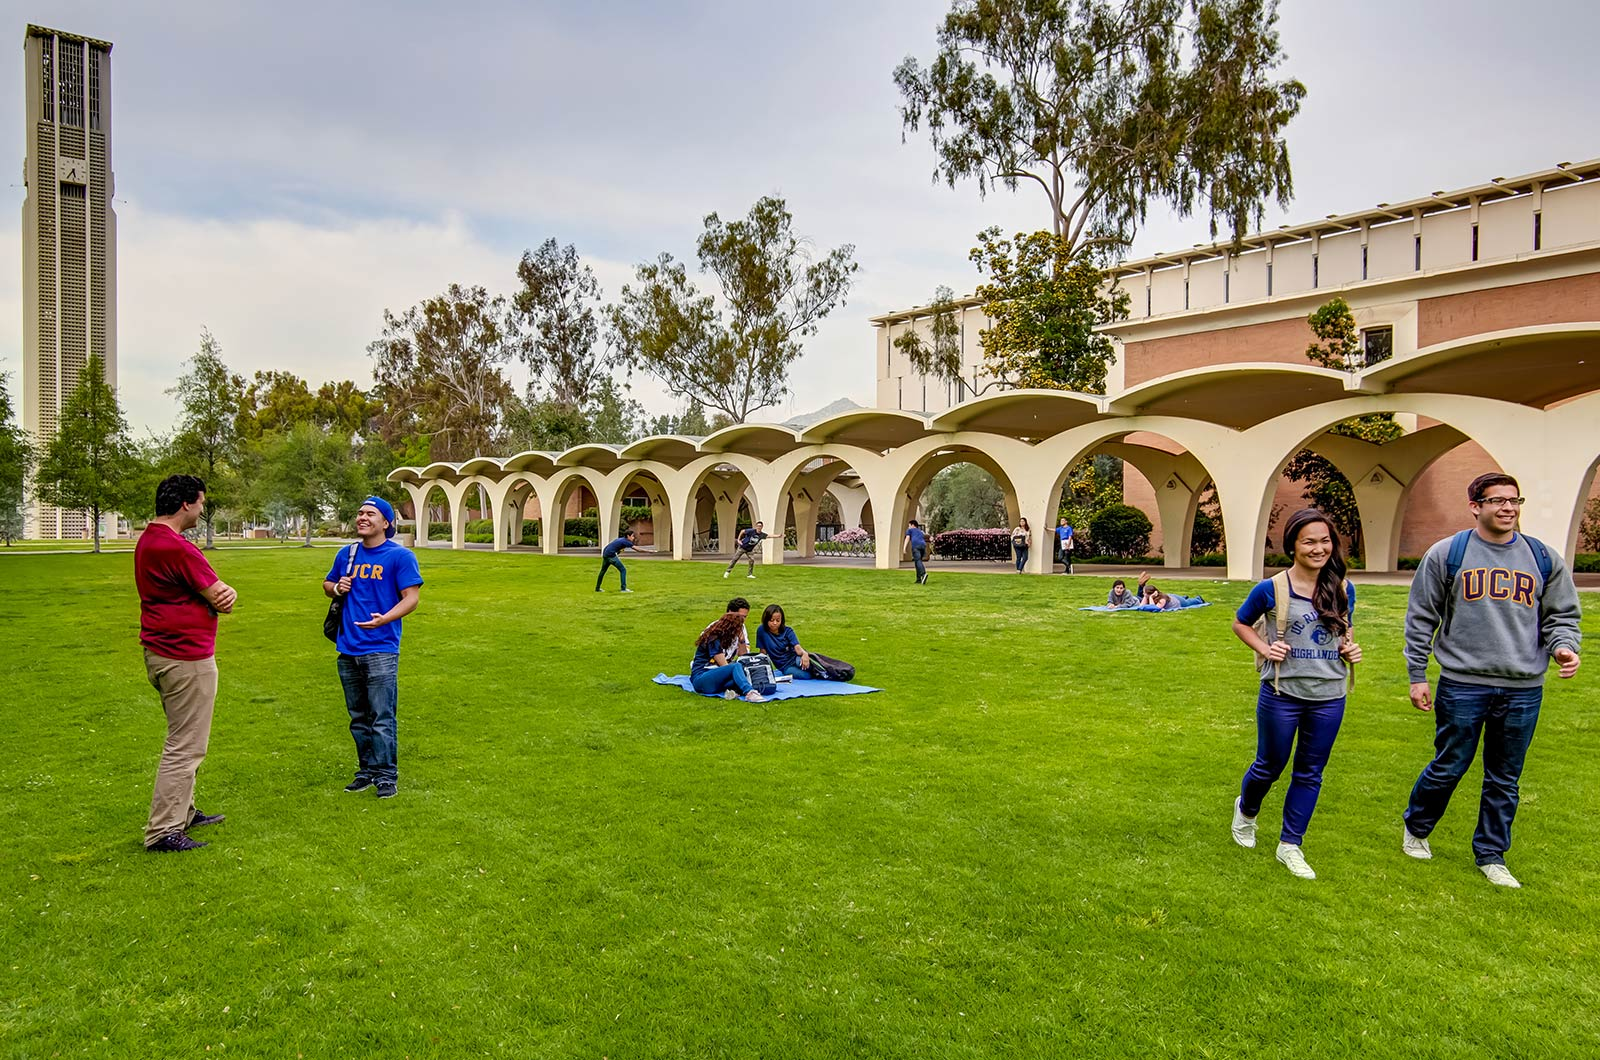 UCR-Social-Space-360-Tours-Virtual-Tour-Company-College-Vitual-Tours-Virtual-Tours-For-College